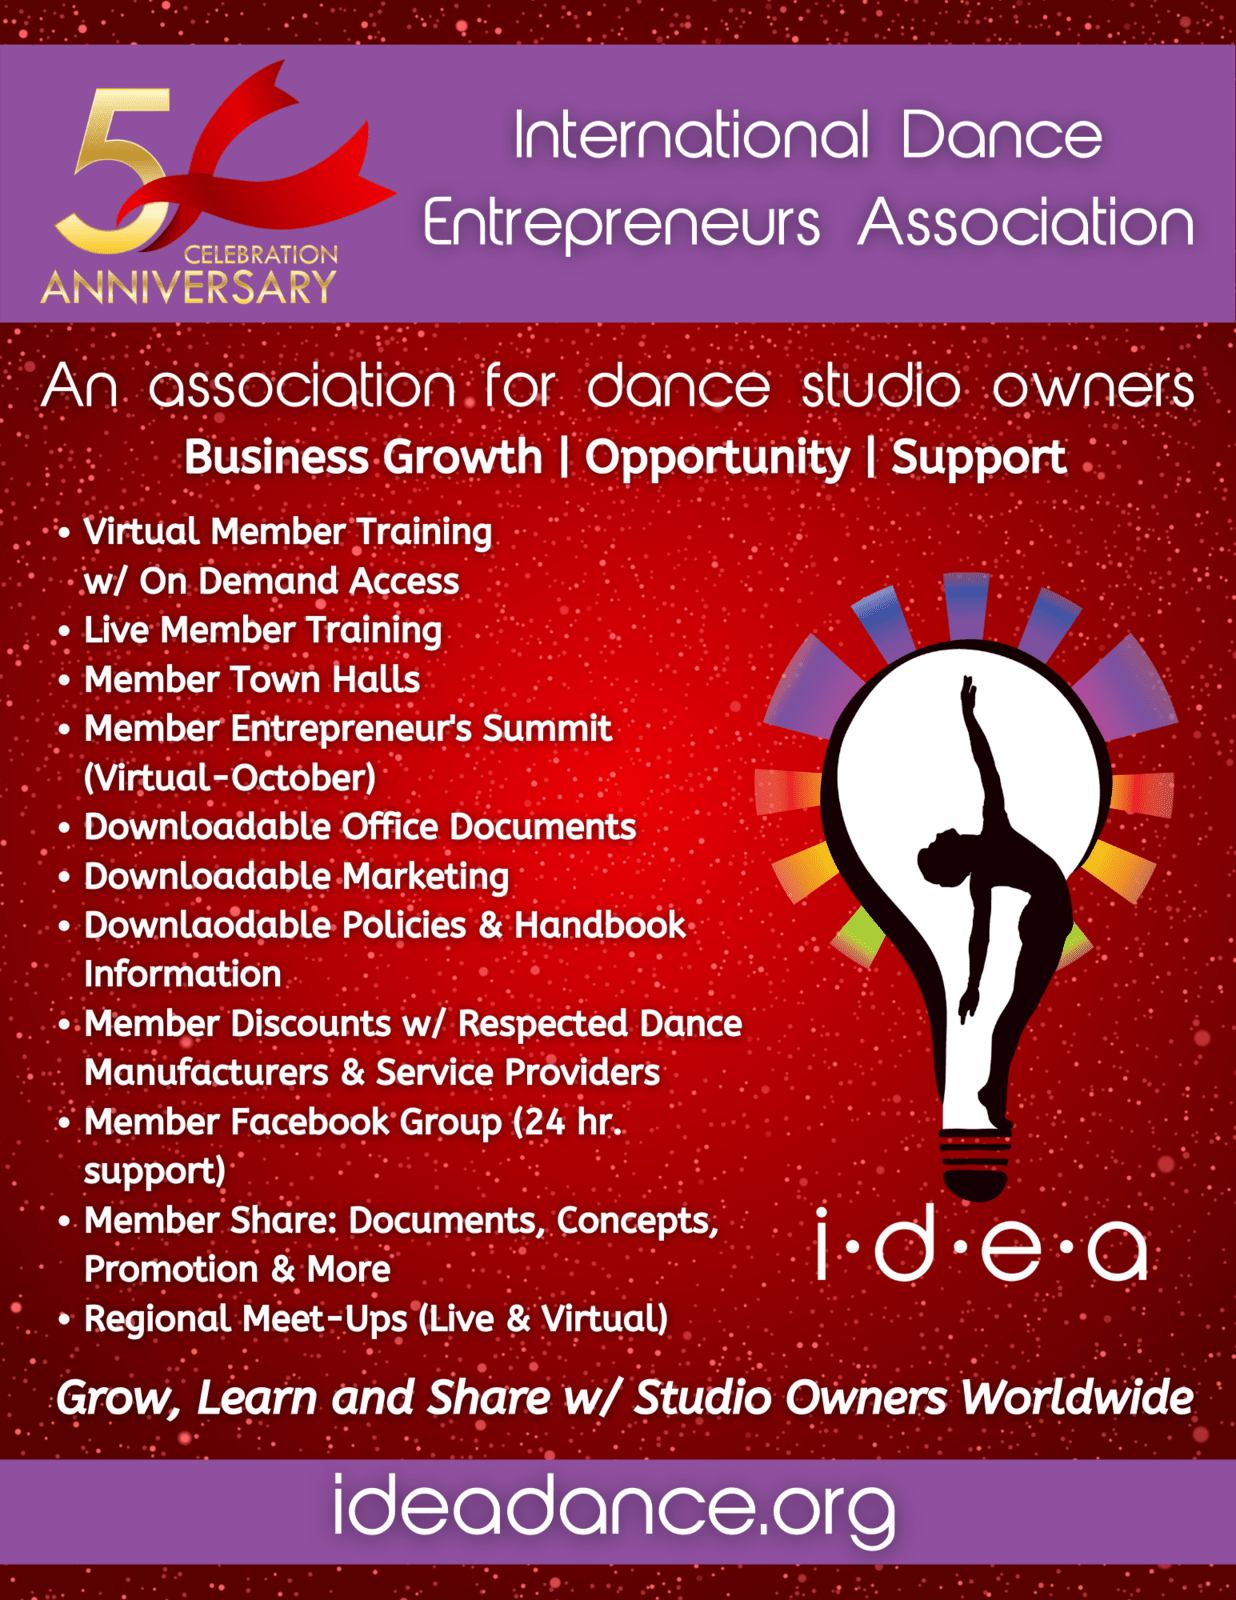 International Dance Entrepreneurs Association